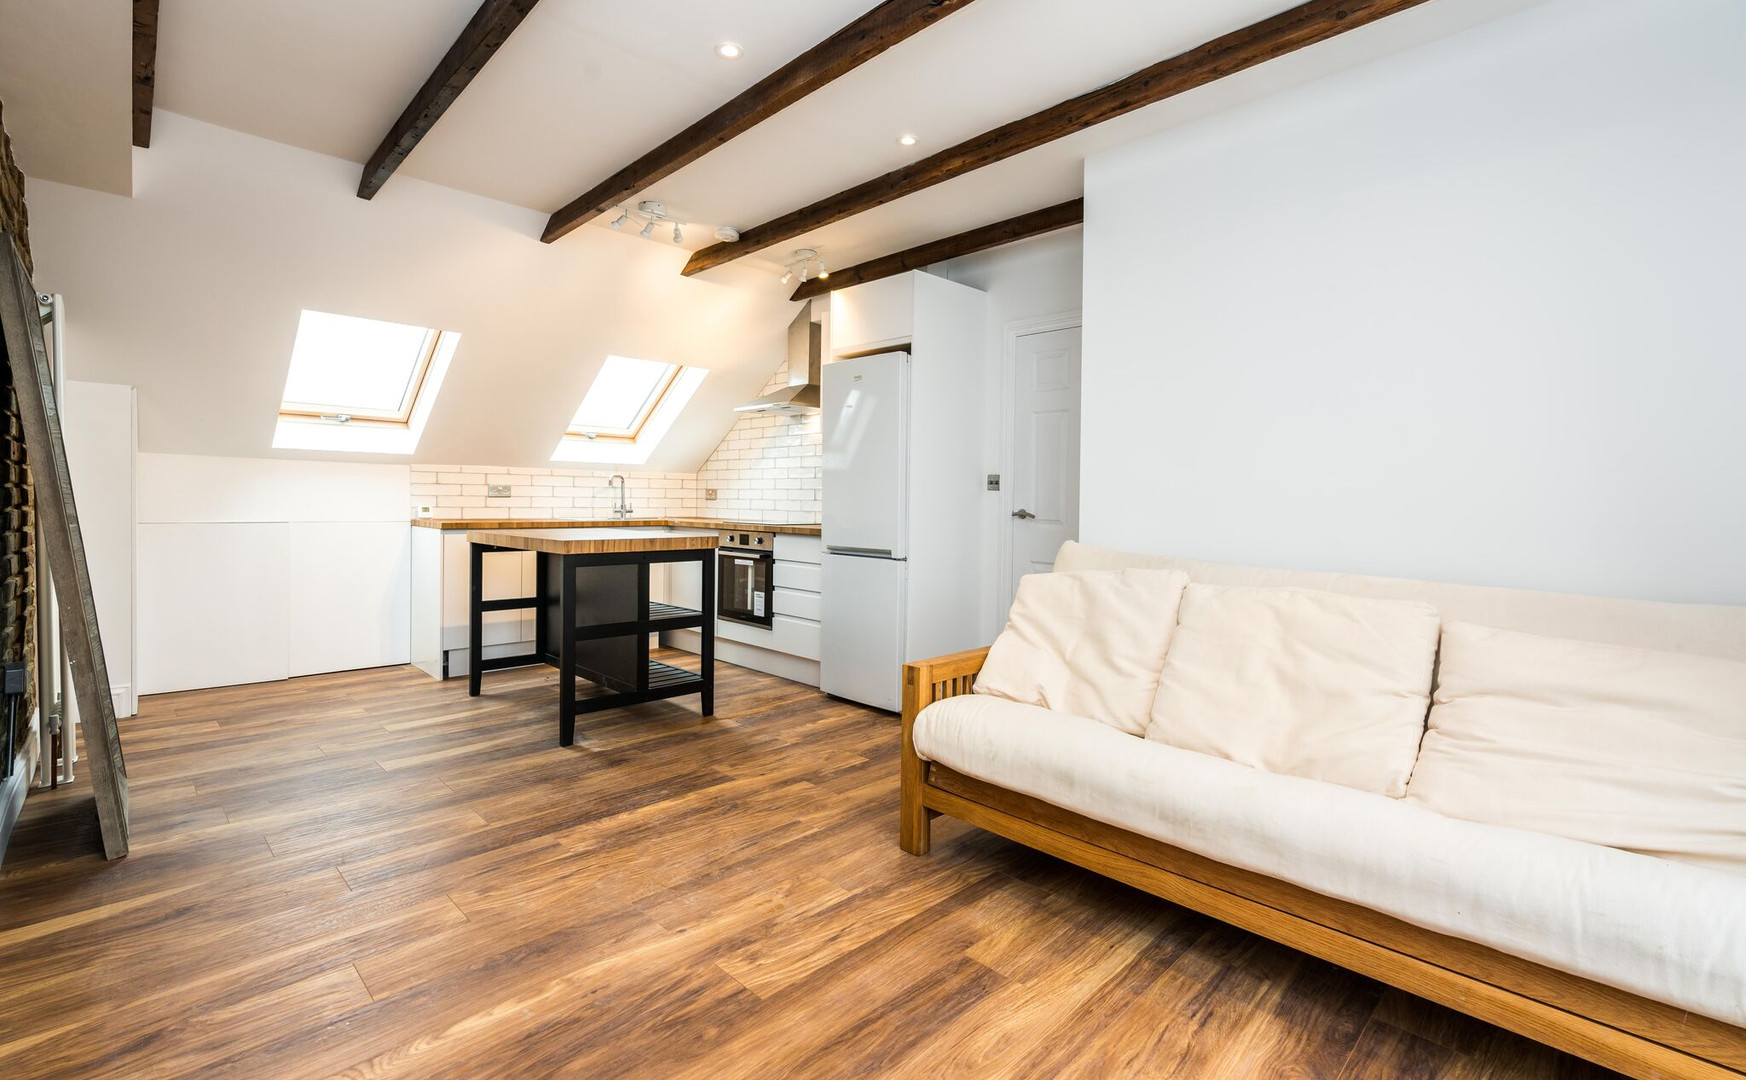 Loft - Open Plan Kitchen and Living.jpeg